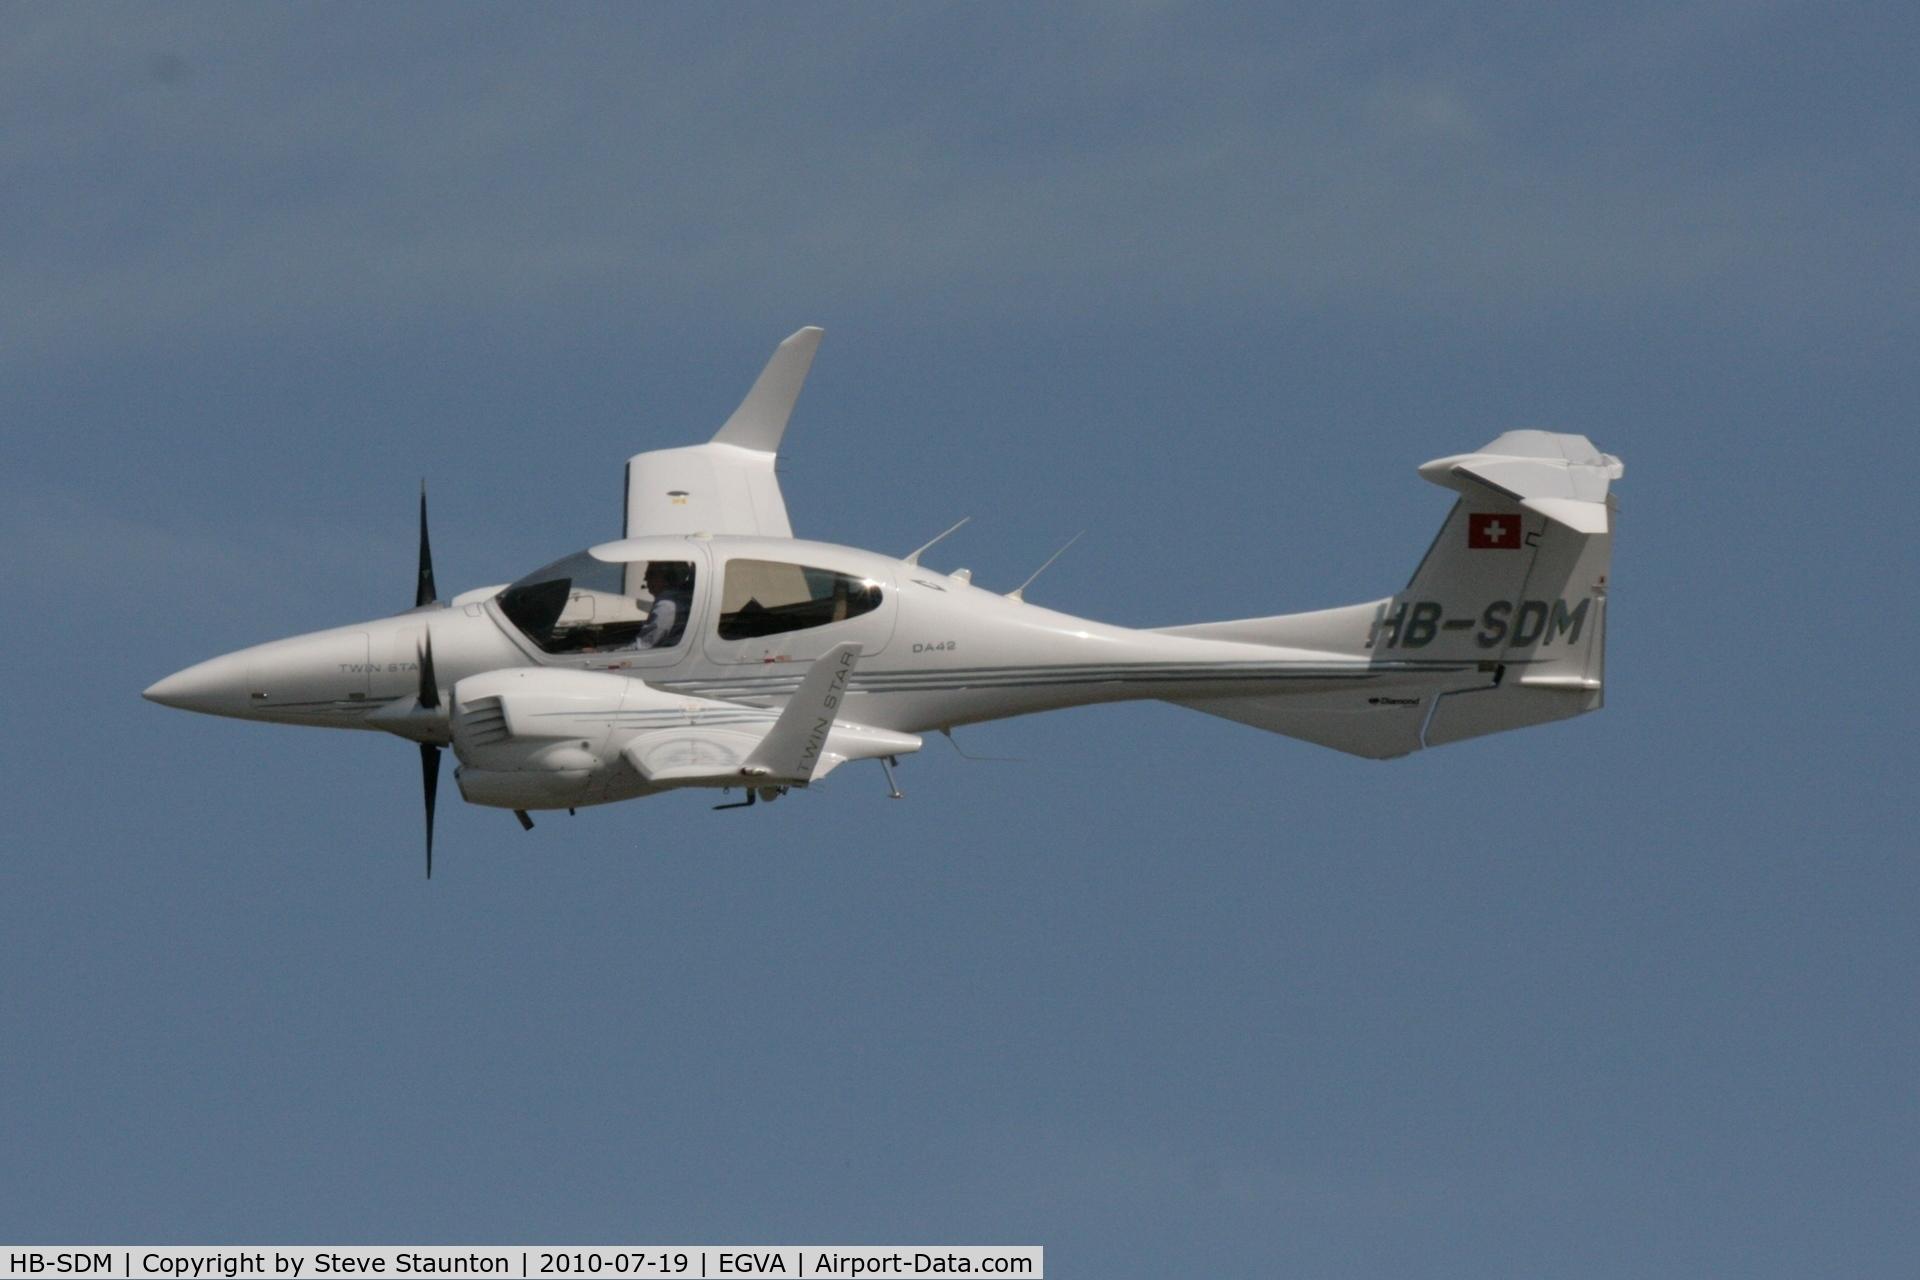 HB-SDM, 2005 Diamond DA-42 Twin Star C/N 42.039, Taken at the Royal International Air Tattoo 2010